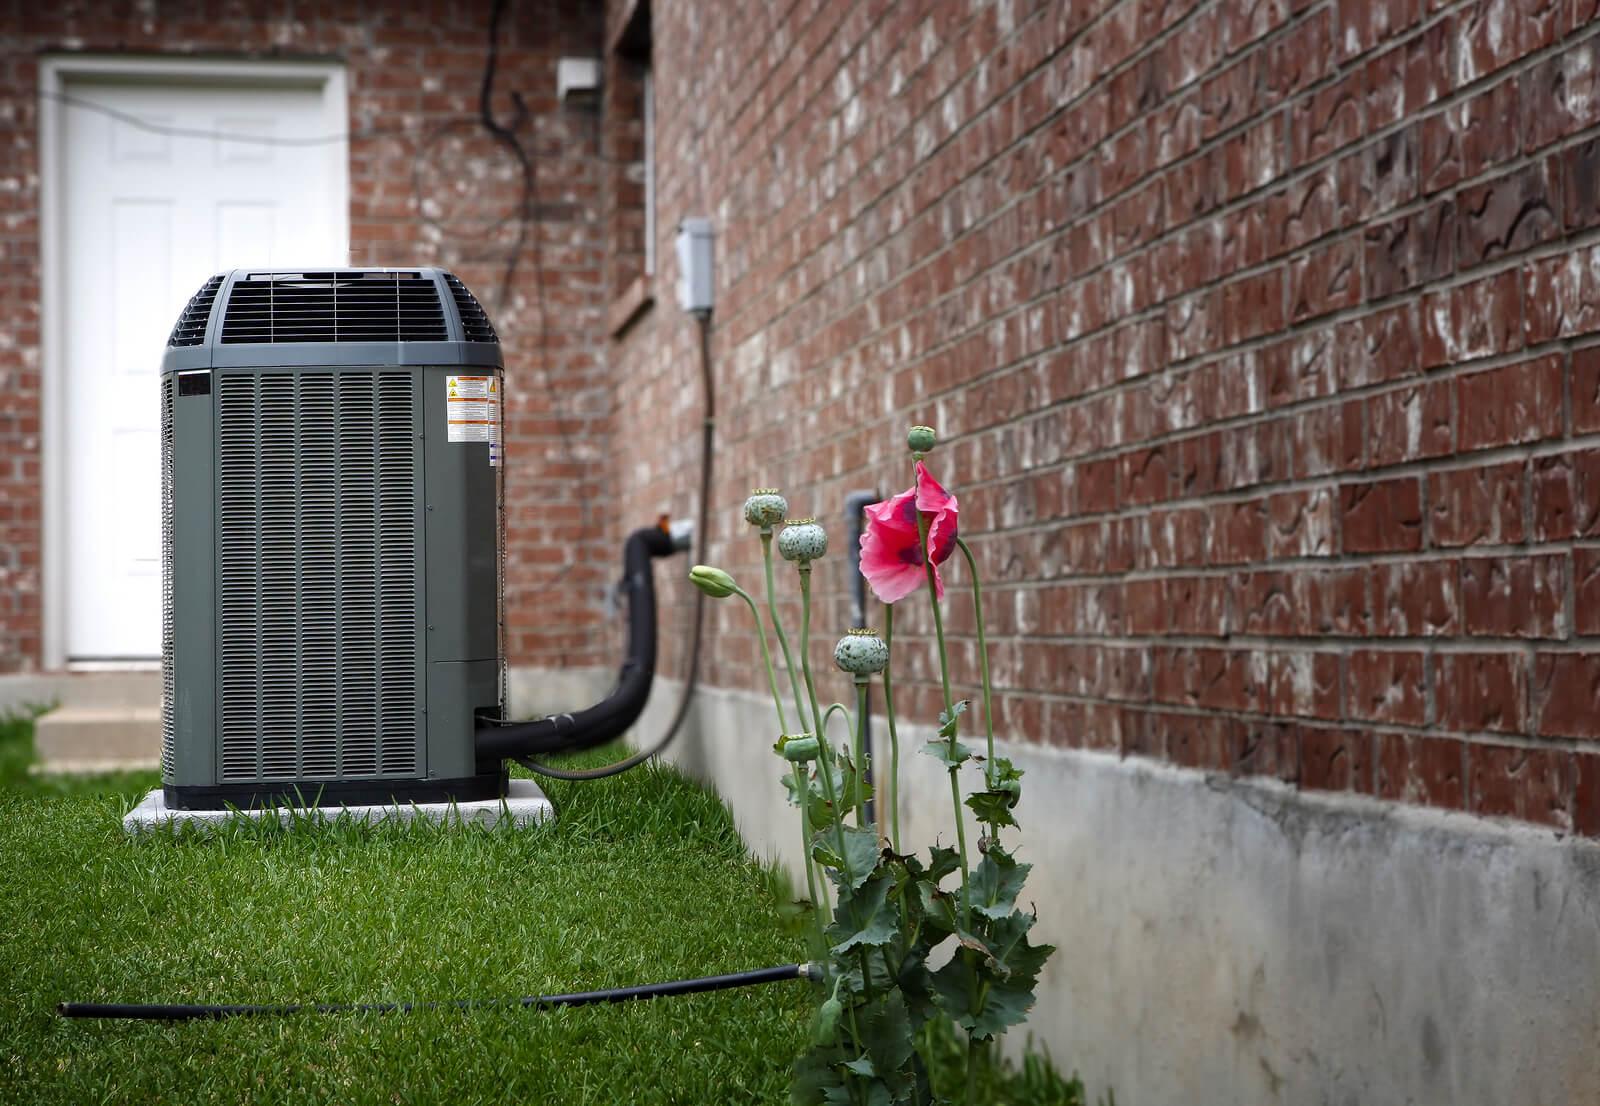 High efficiency modern AC-heater unit, energy save solution on backyard